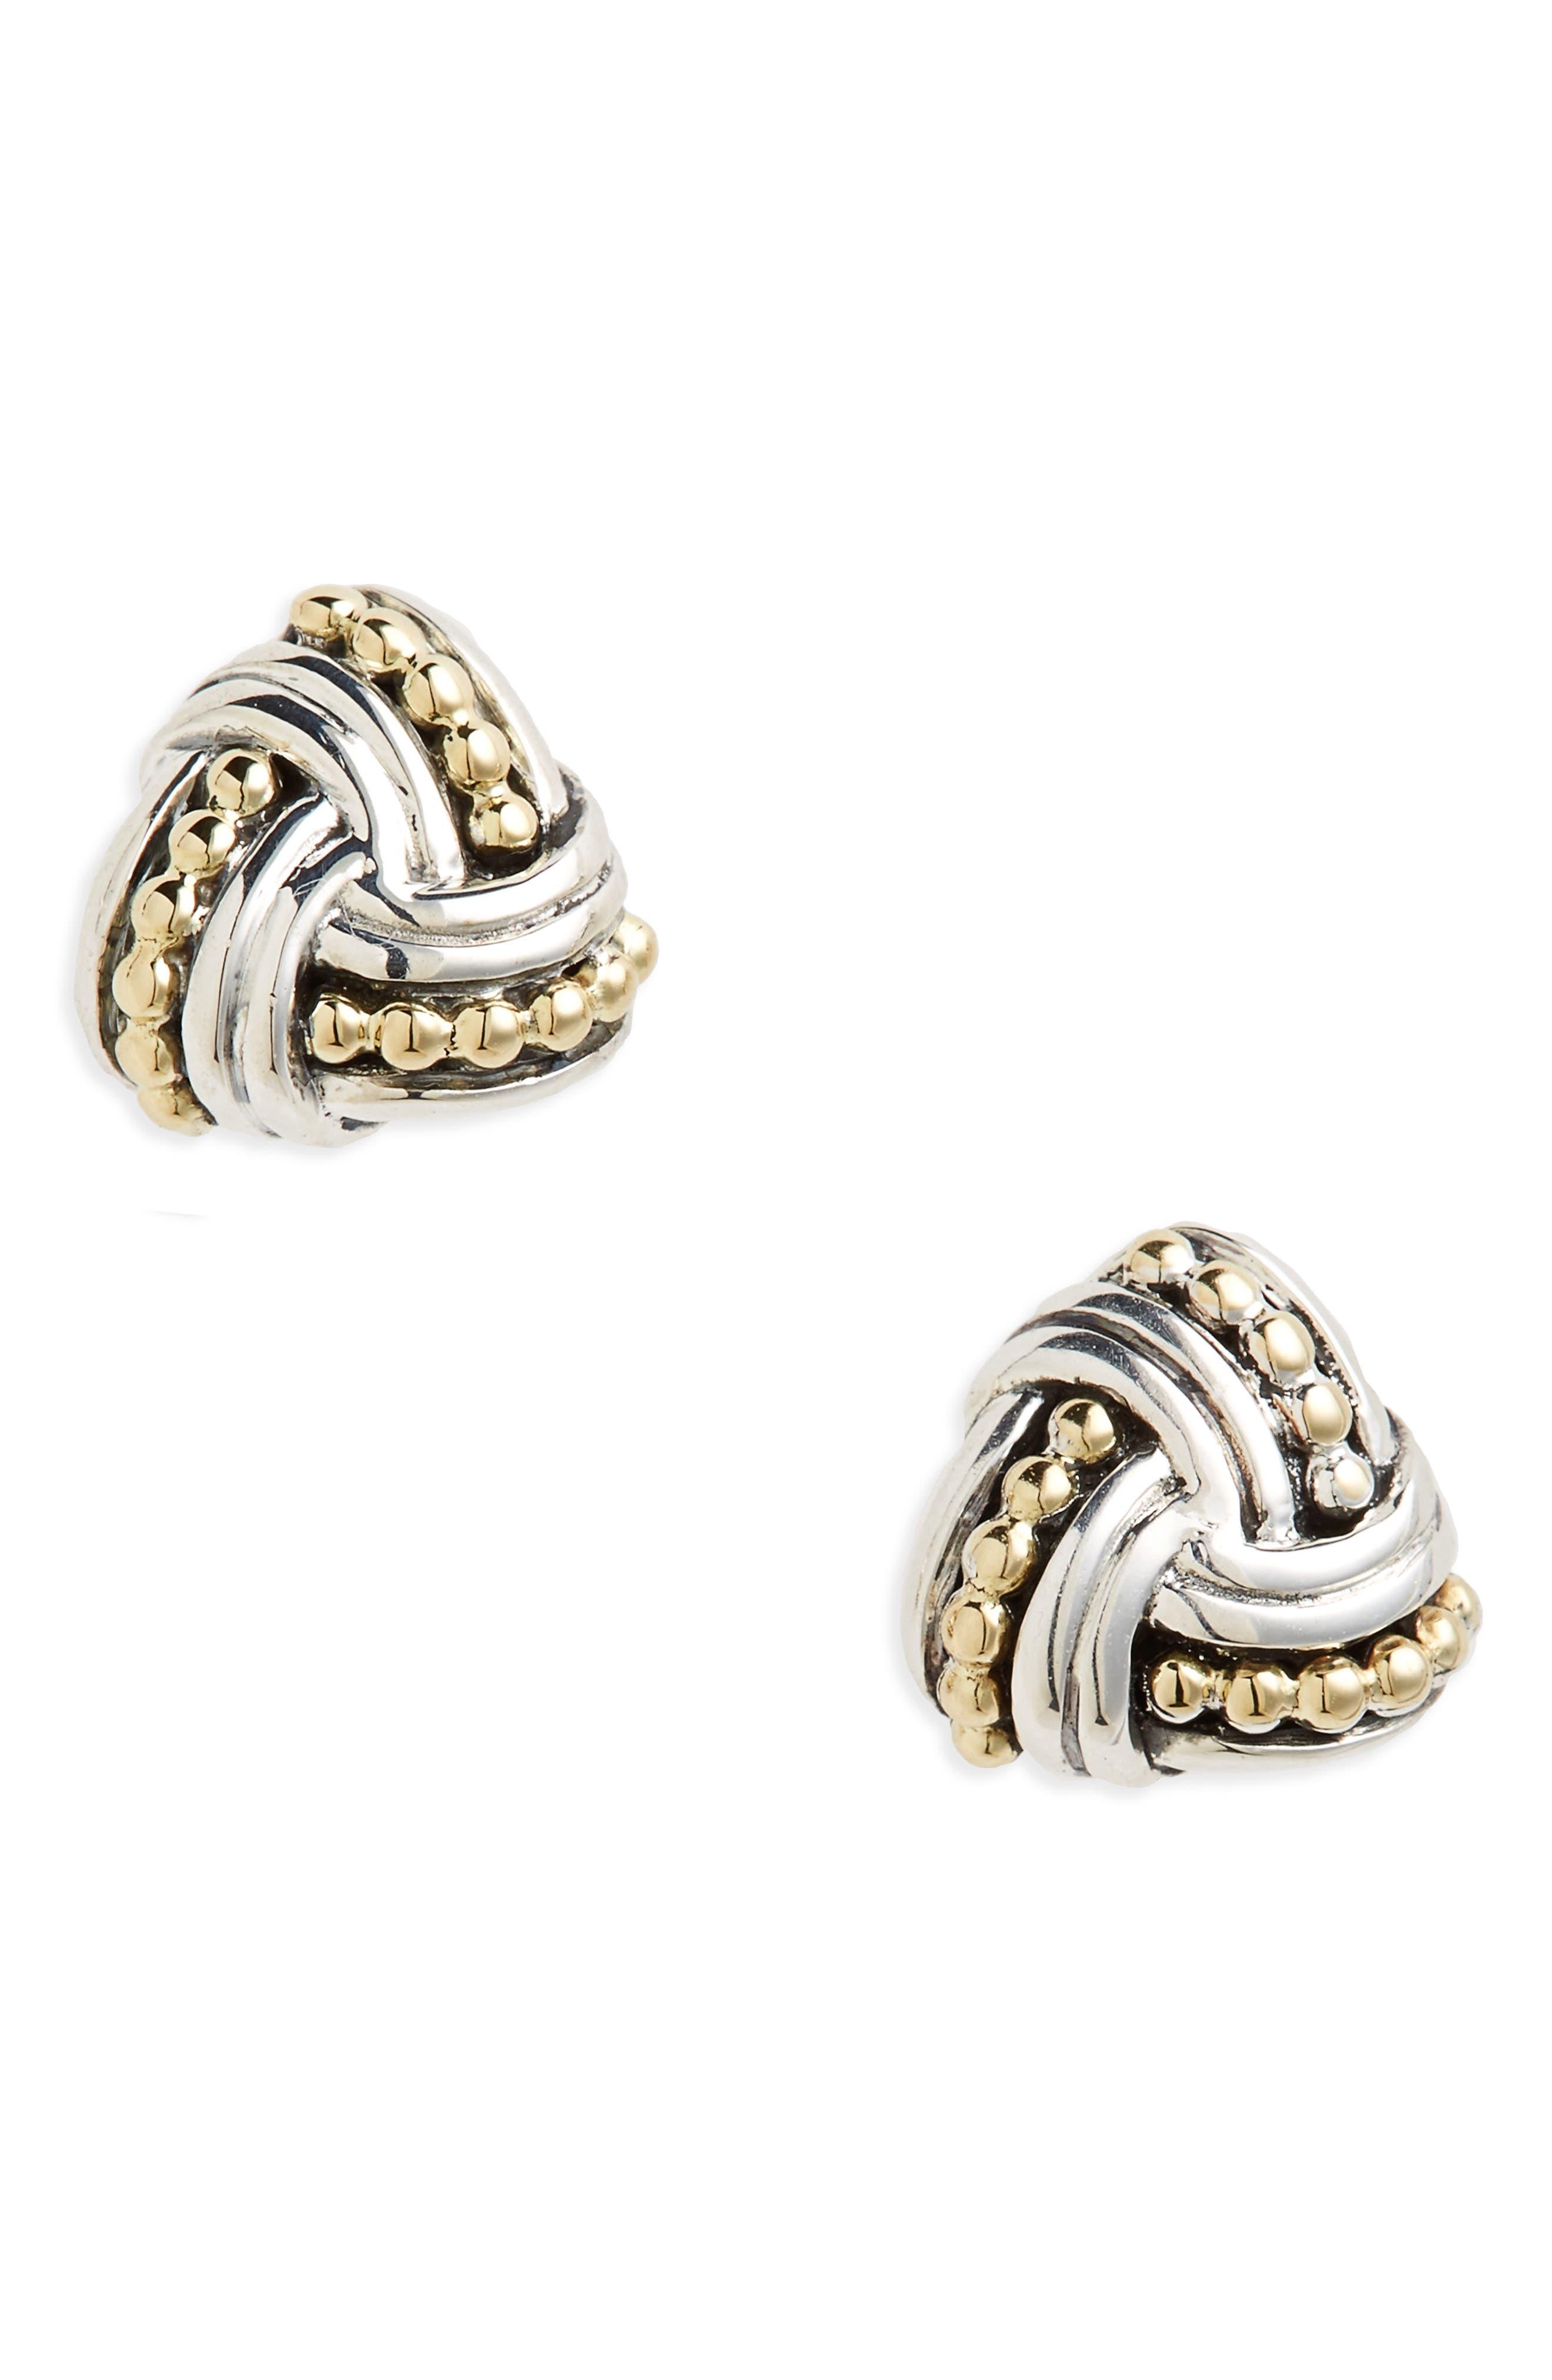 Torsade Stud Earrings,                         Main,                         color, Silver/ Gold